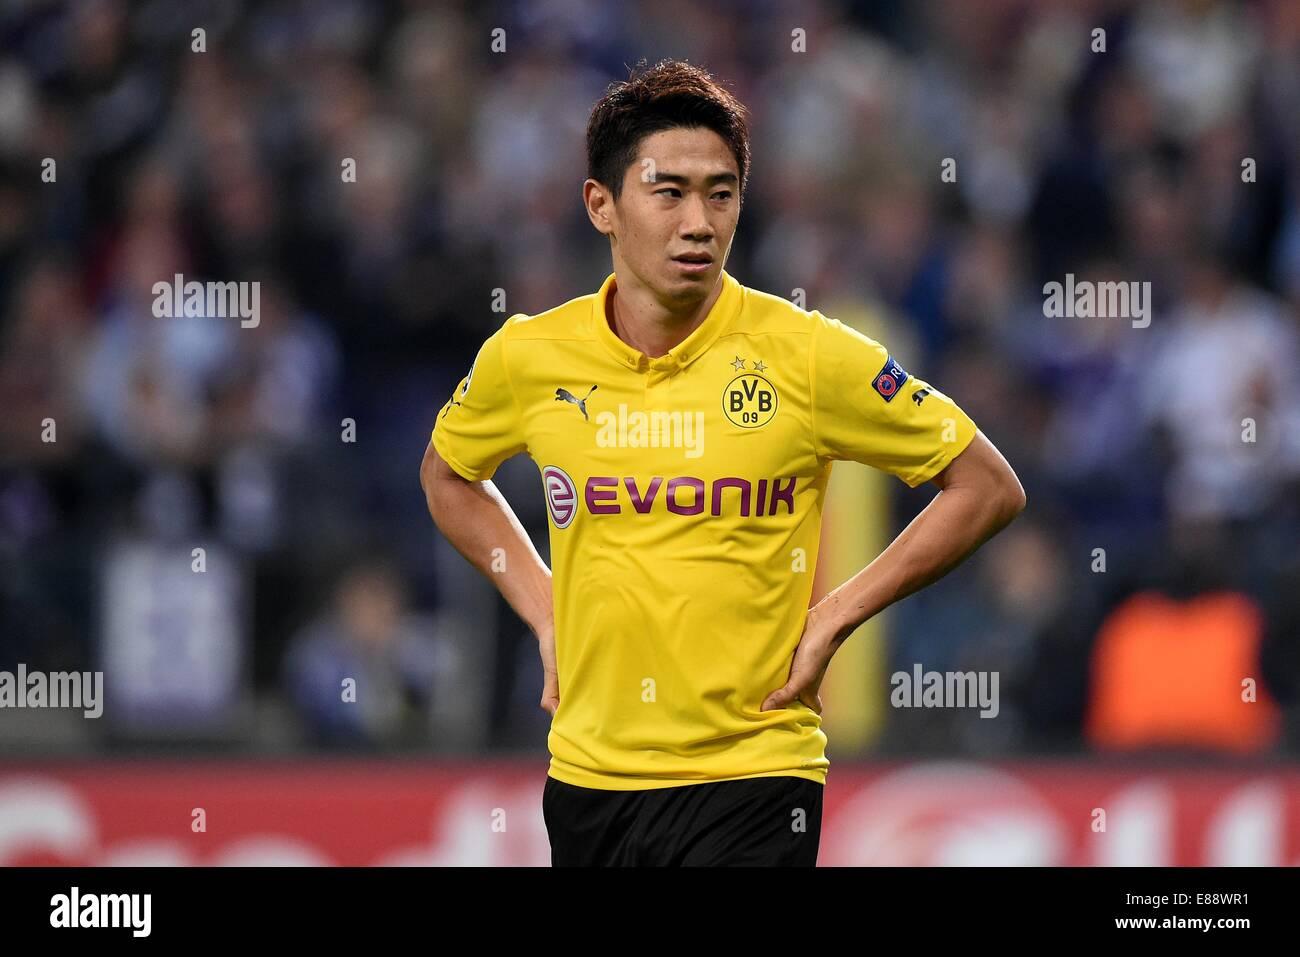 Shinji Kagawa of Borussia Dortmund reacts during the UEFA Champion League Group D soccer match between RSC Anderlecht - Stock Image